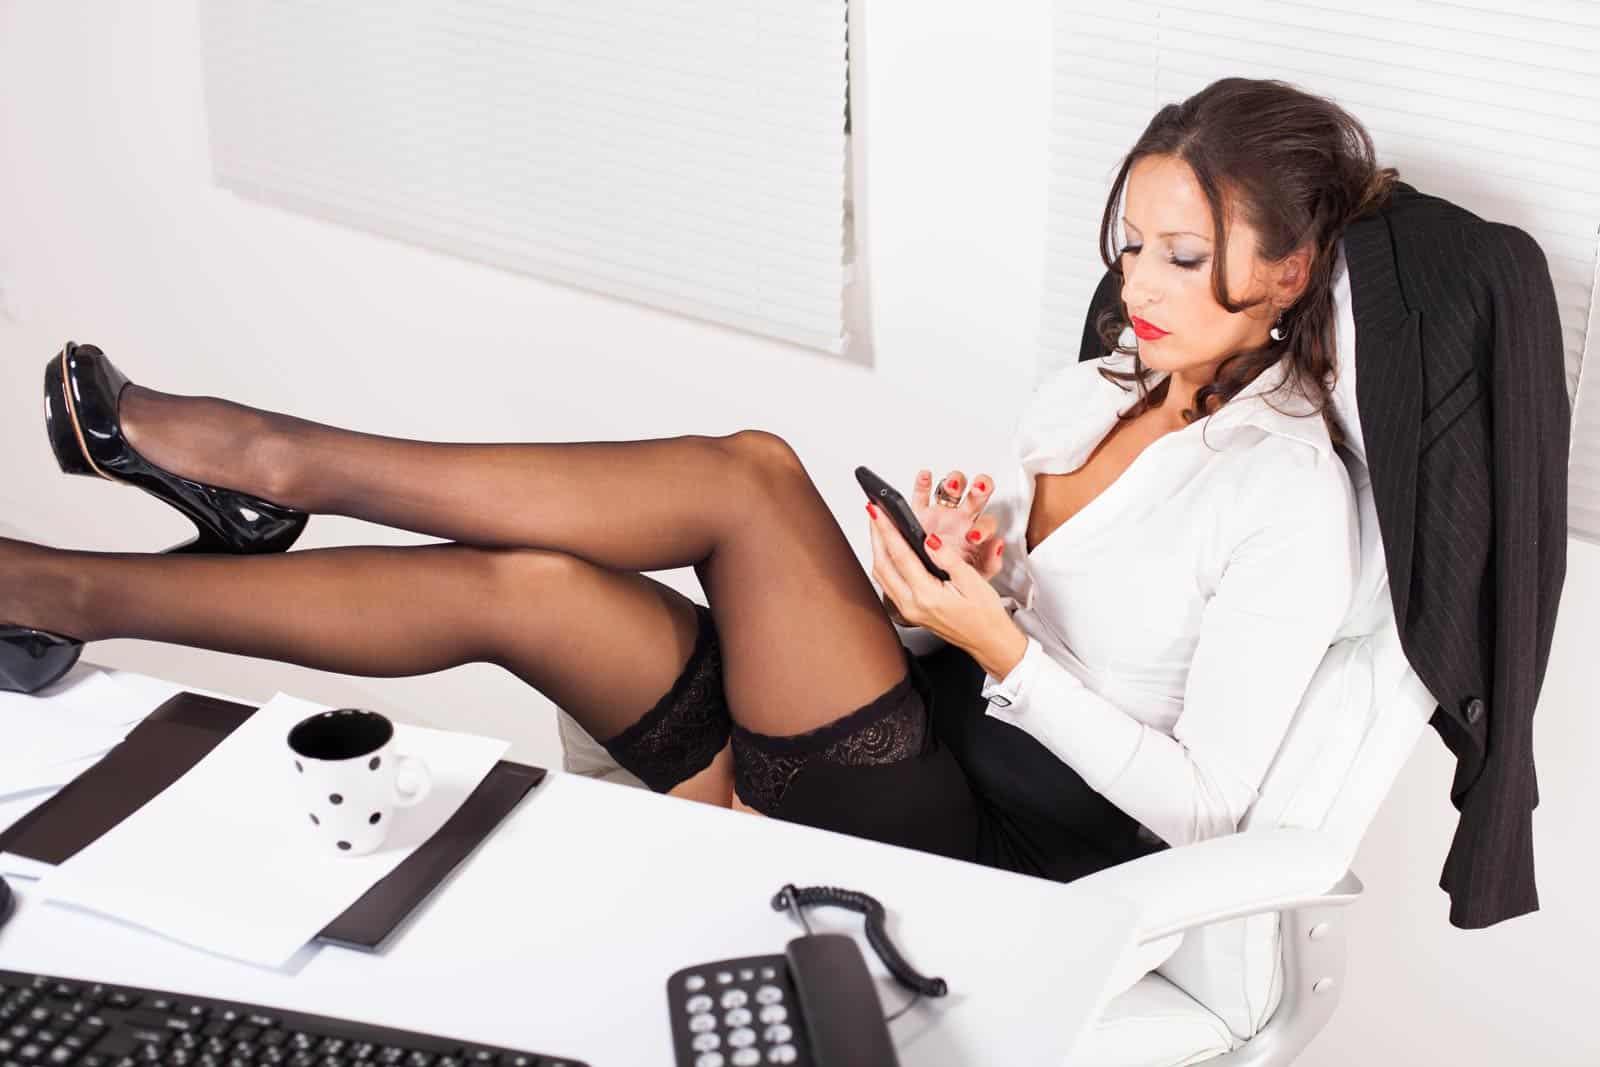 064 hotline